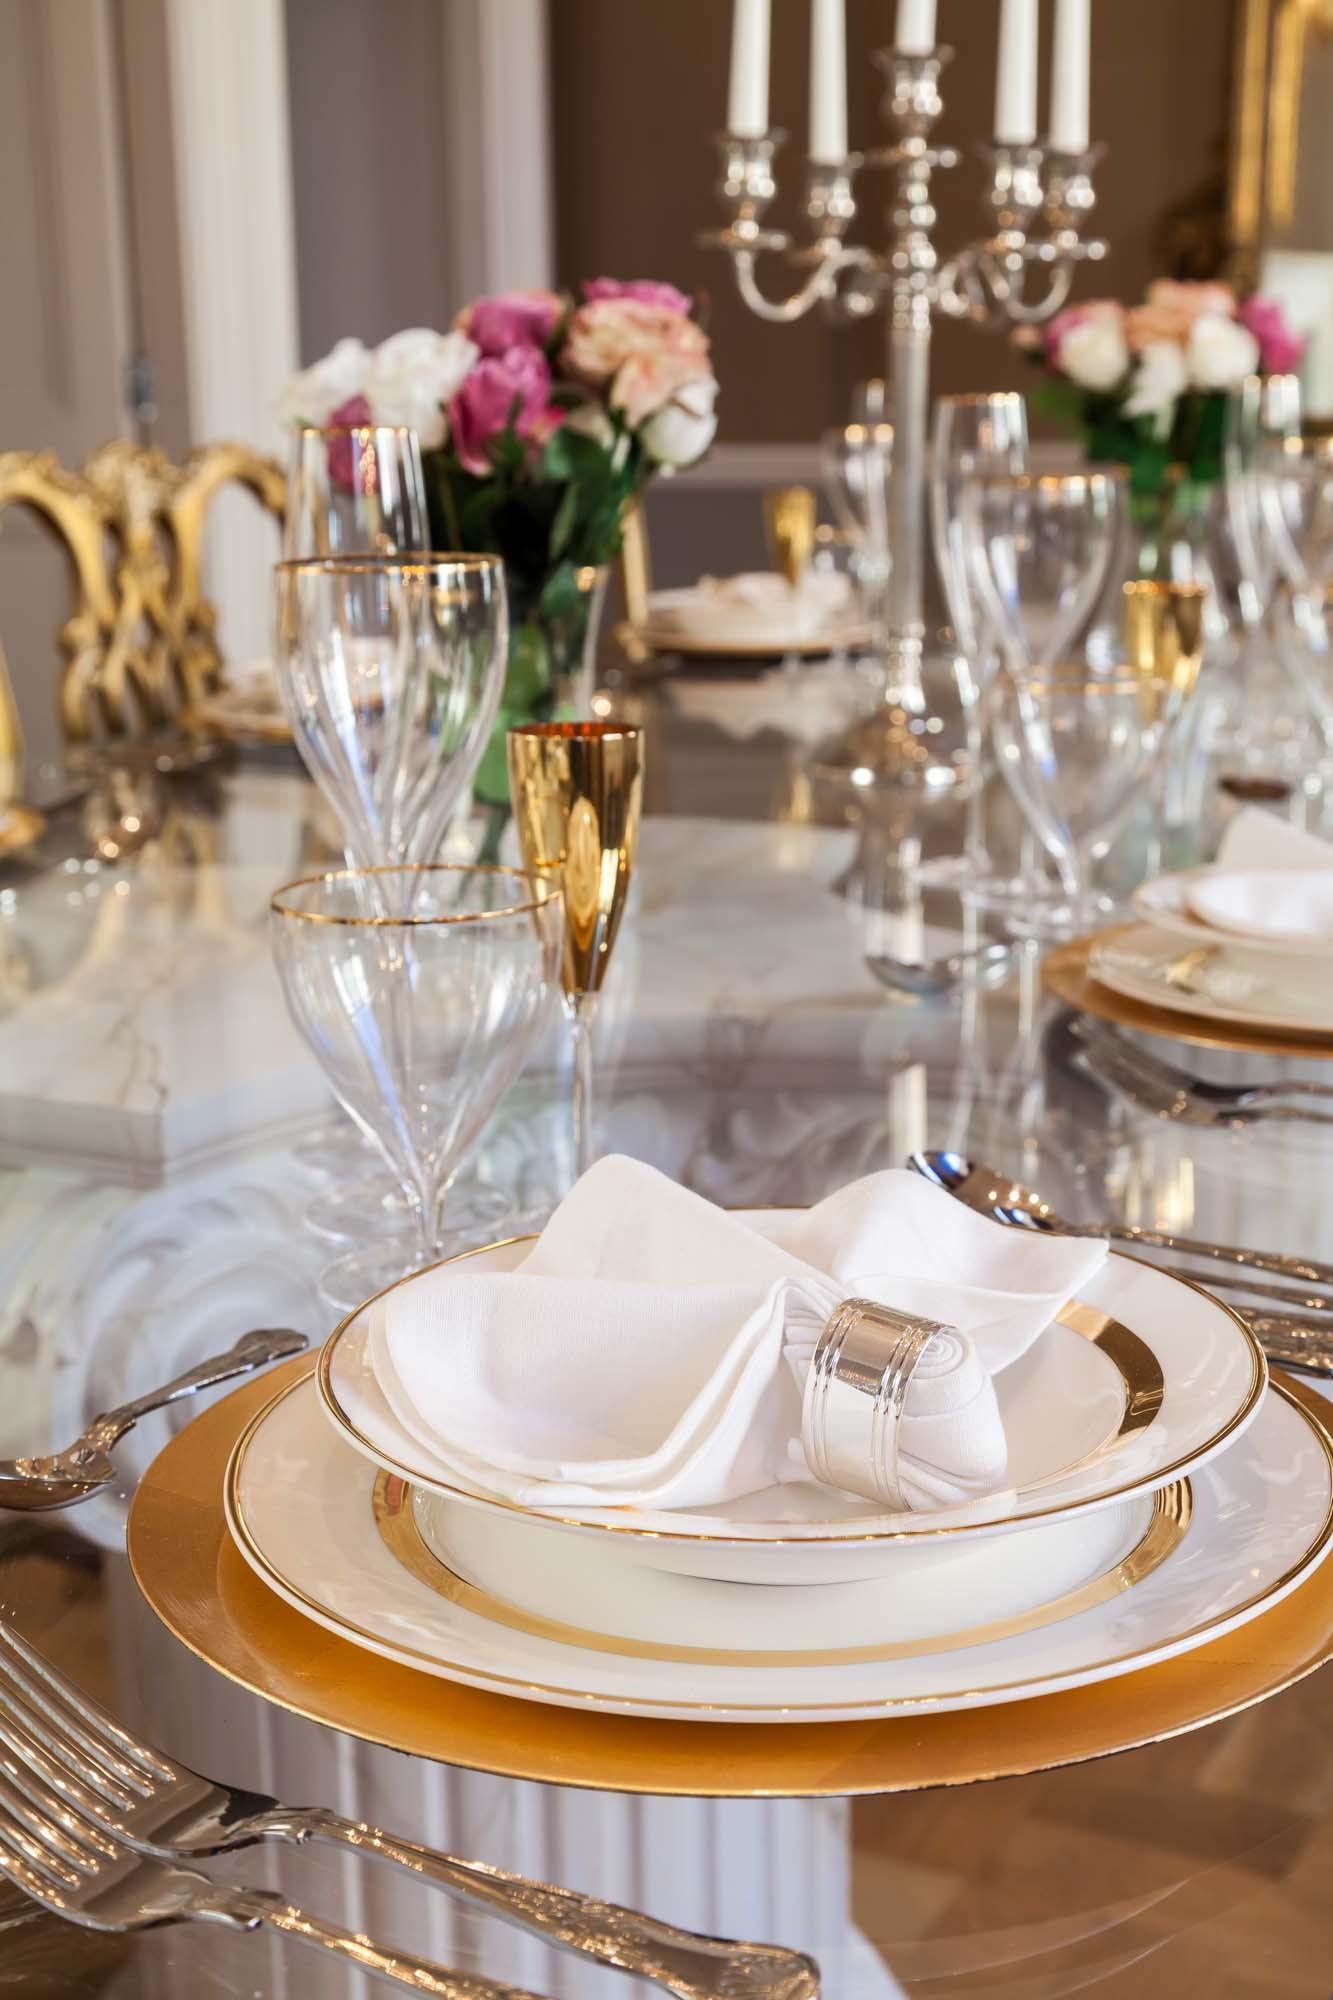 jonathan bond photography, dinner service, dinner & plate sets, hyde park, london